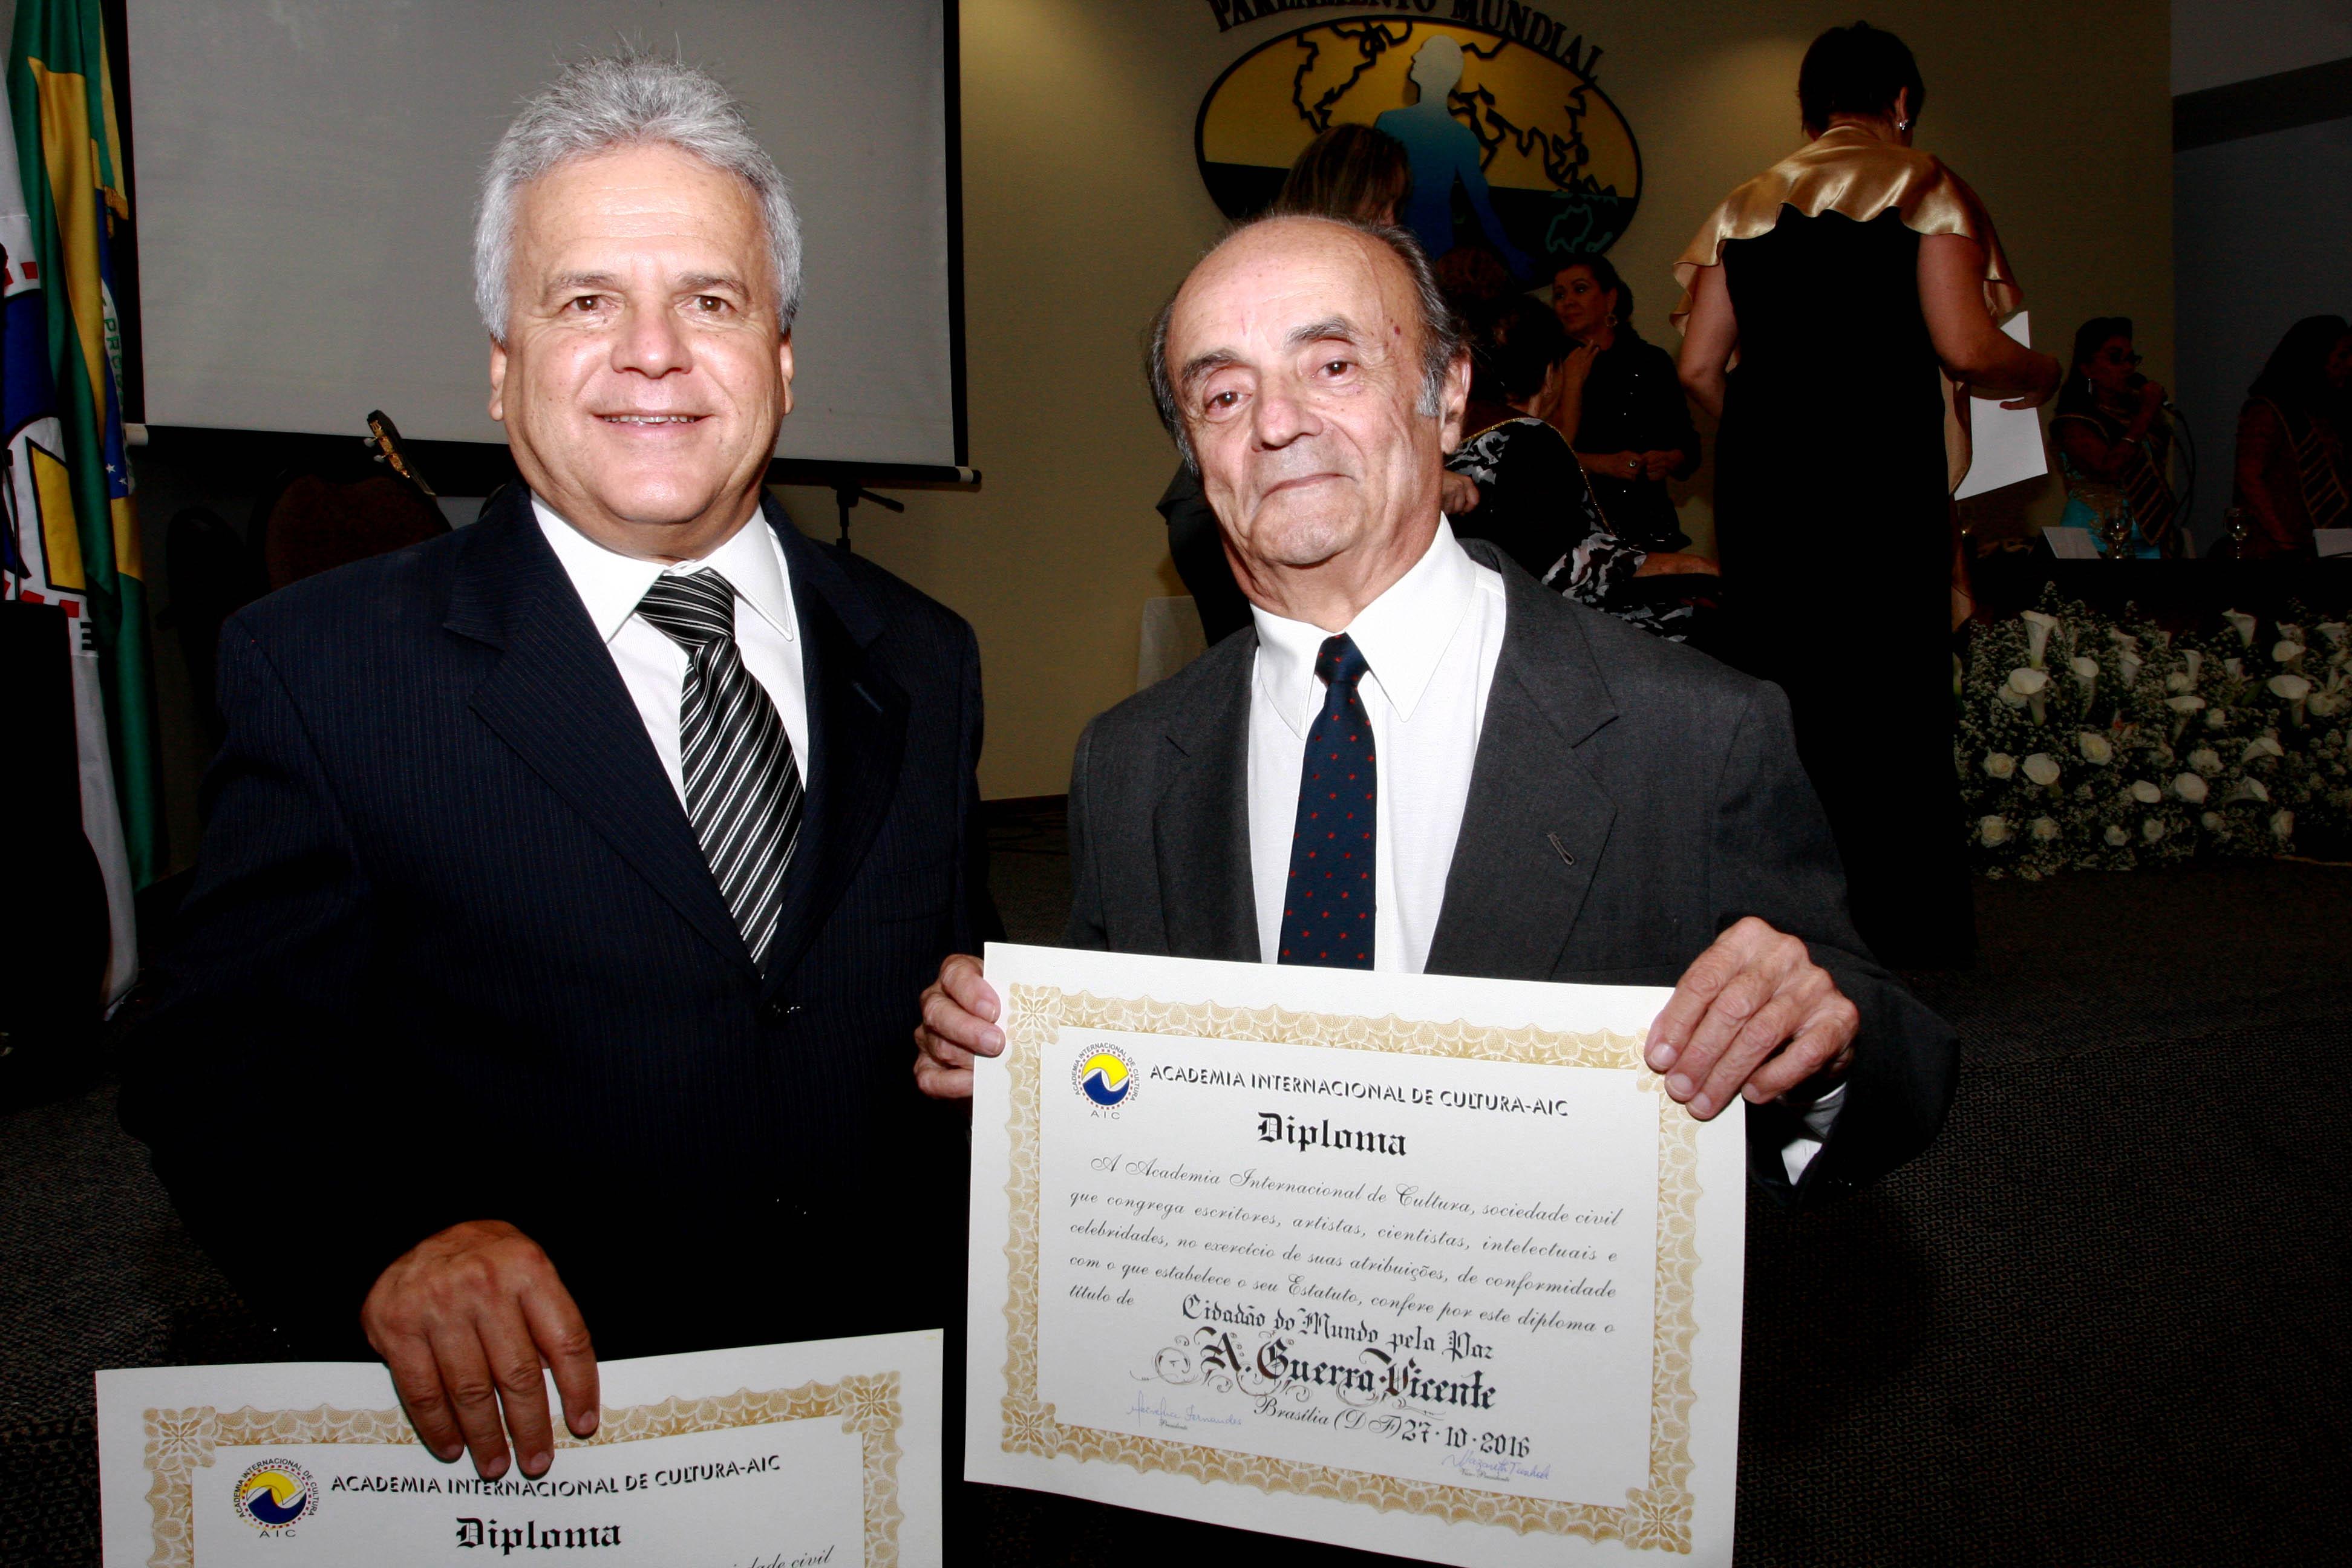 Luiz Carlos Fonseca e Antônio Gerra